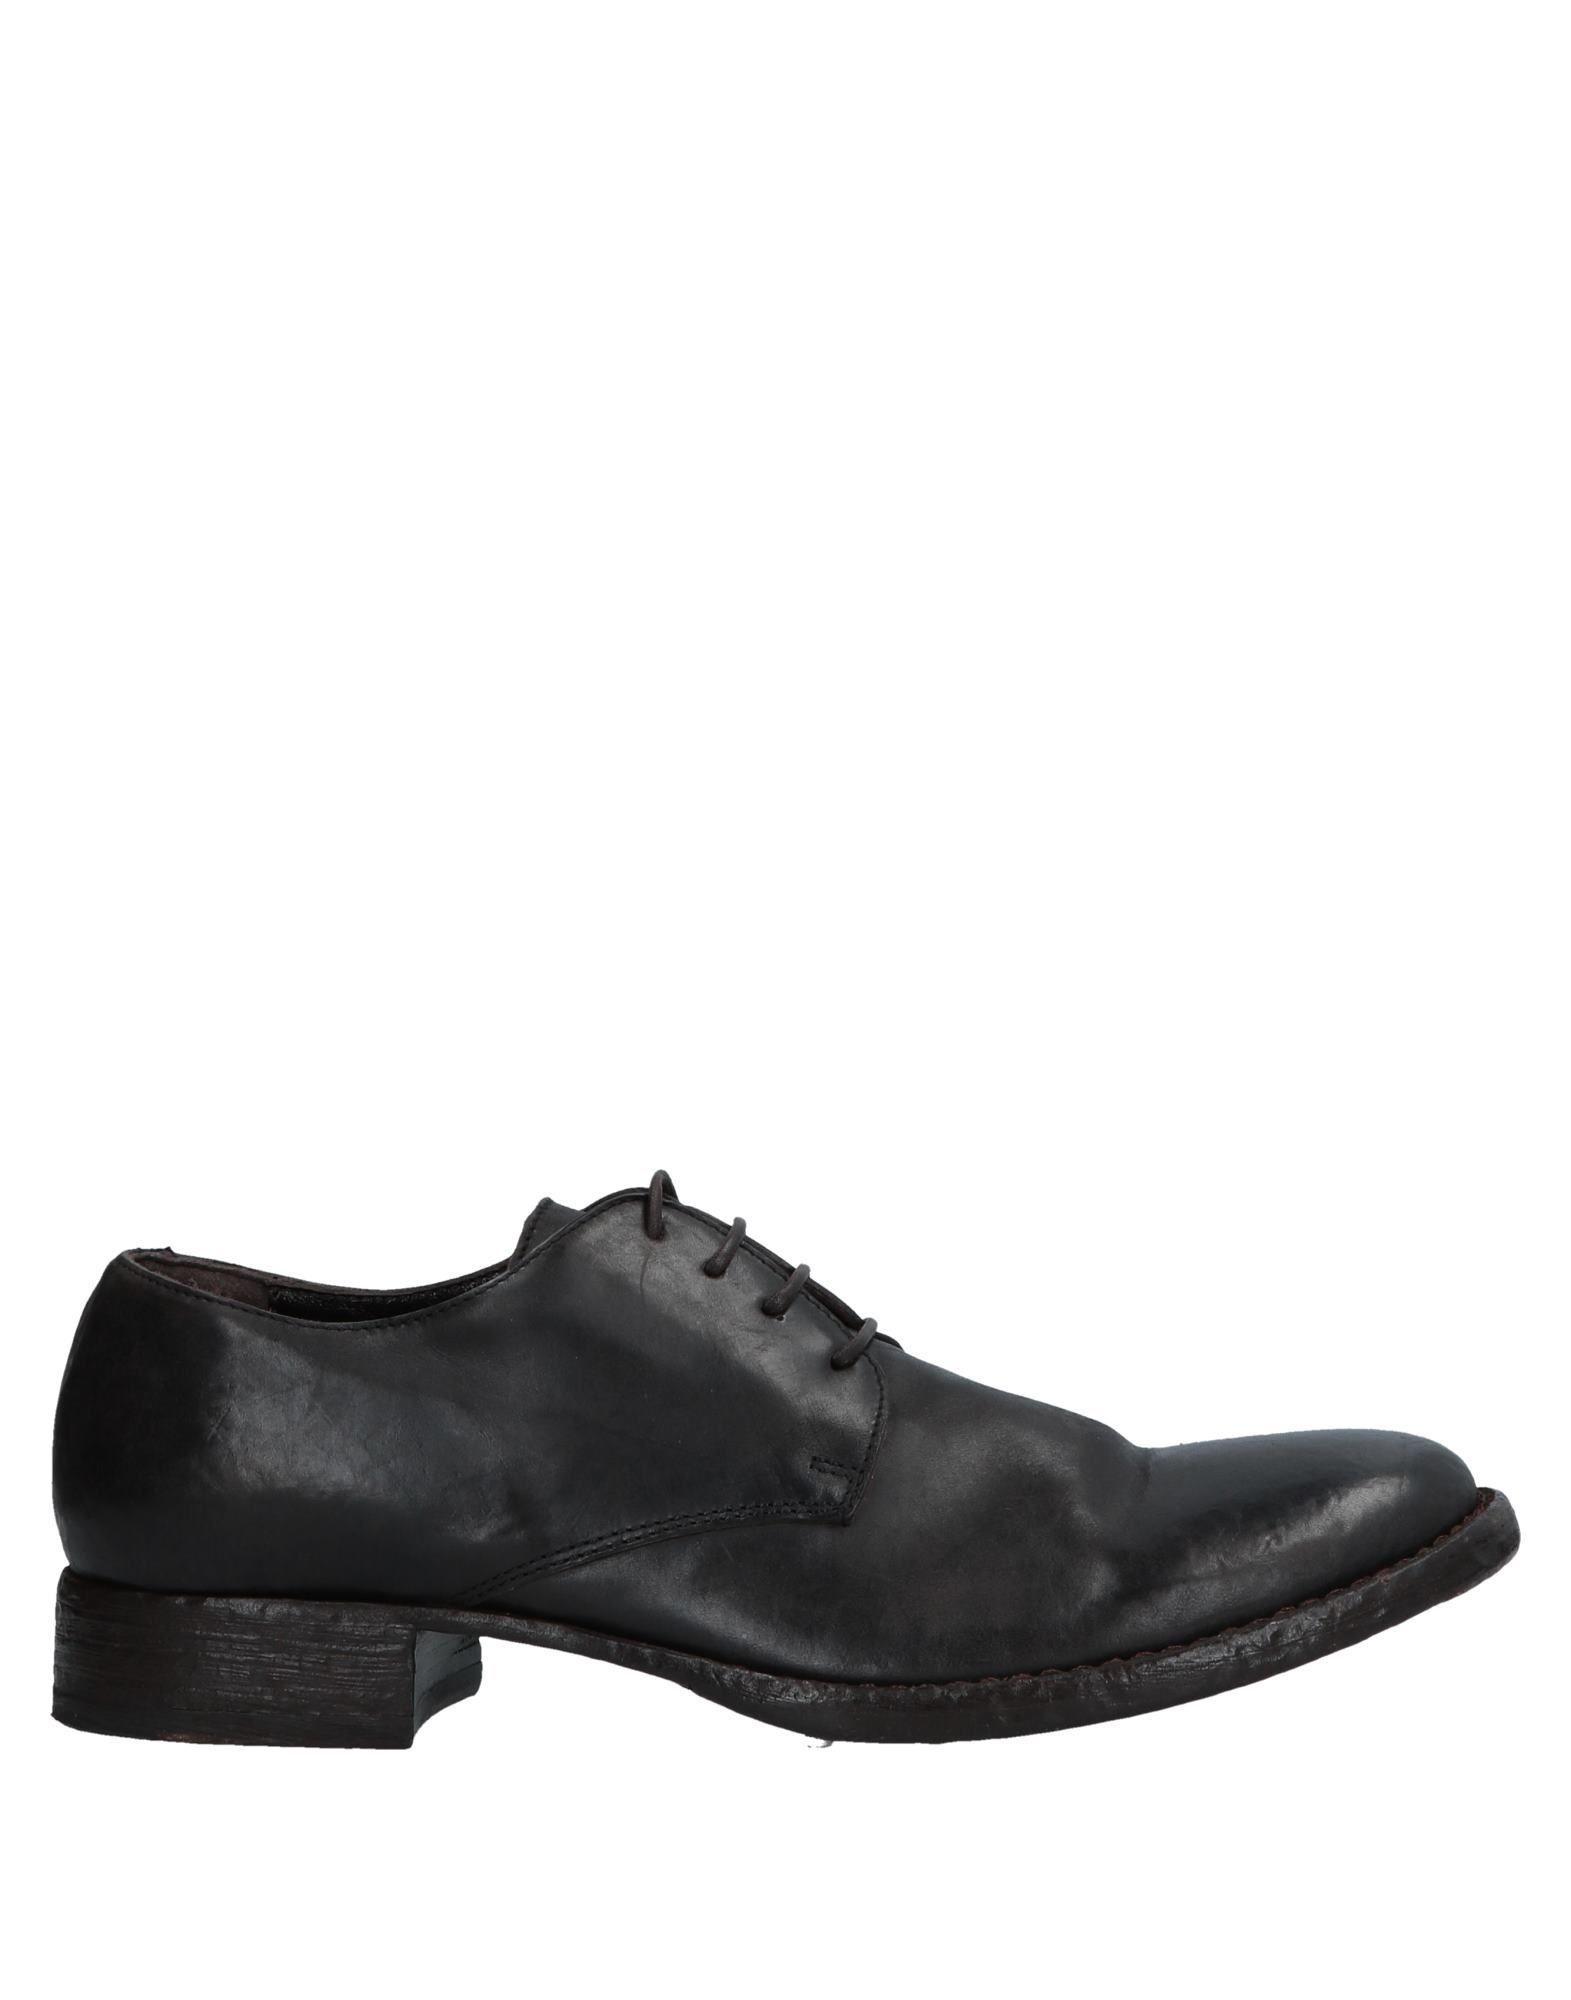 OPEN CLOSED SHOES Обувь на шнурках arsenico shoes обувь на шнурках